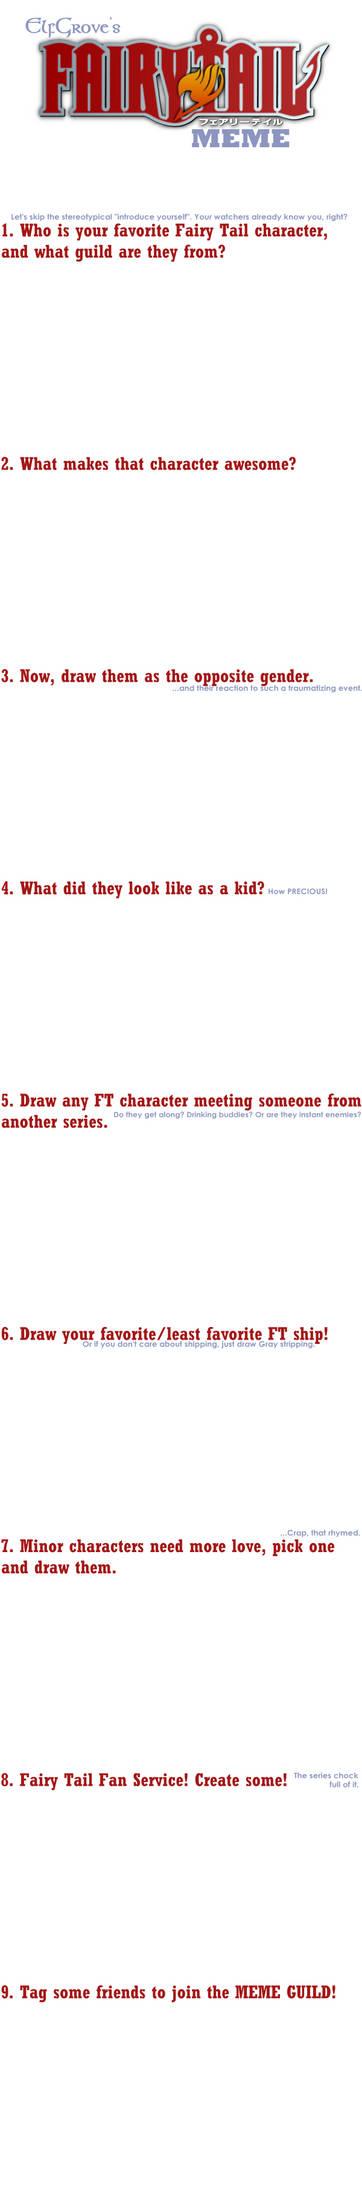 Fairy Tail Meme Blank